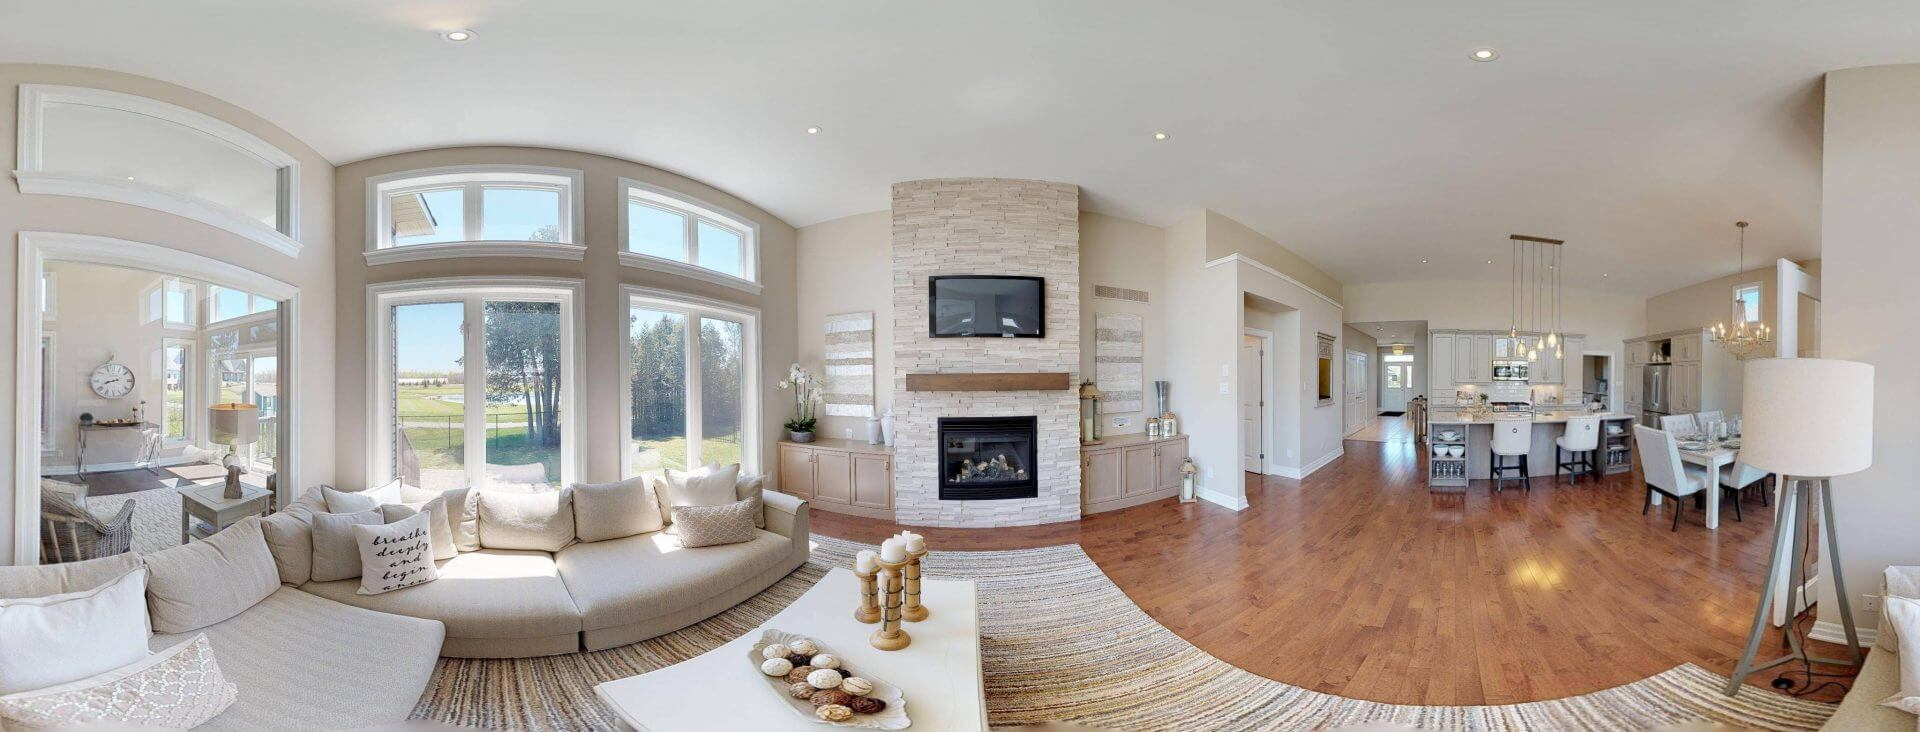 residential-real-estate ottawa-matterport 360-photo